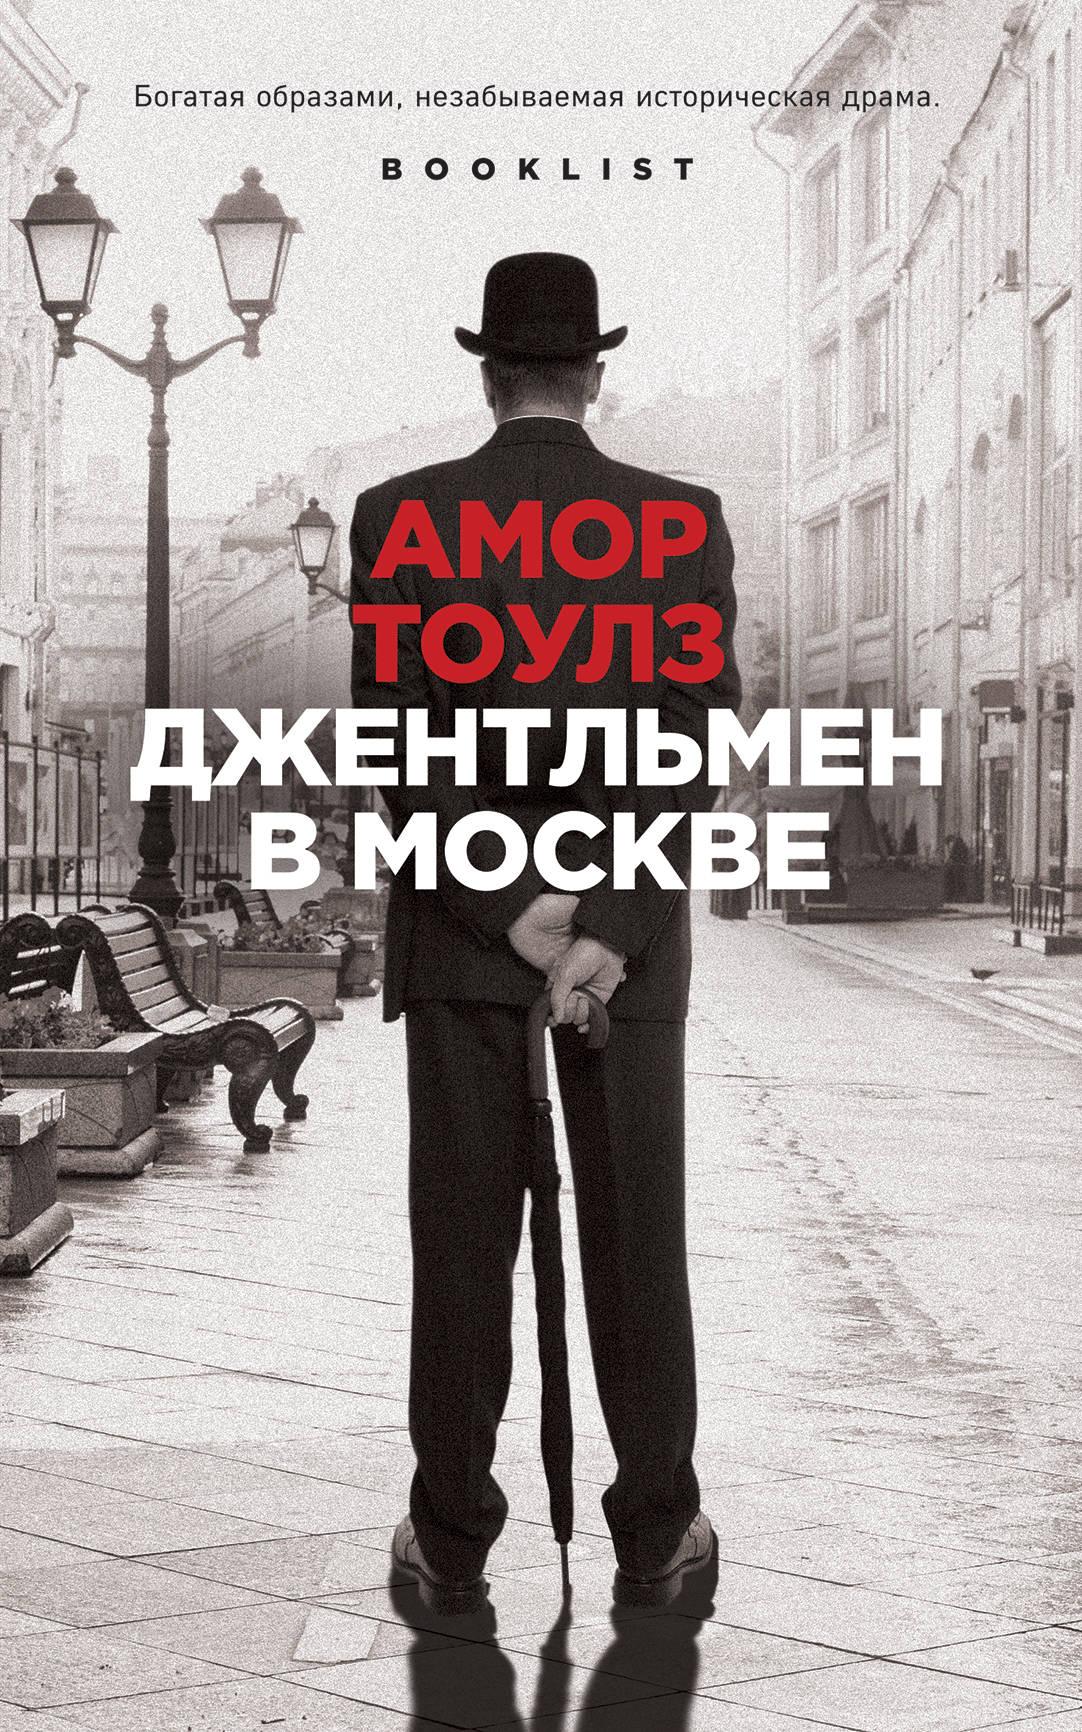 Амор Тоулз Джентльмен в Москве